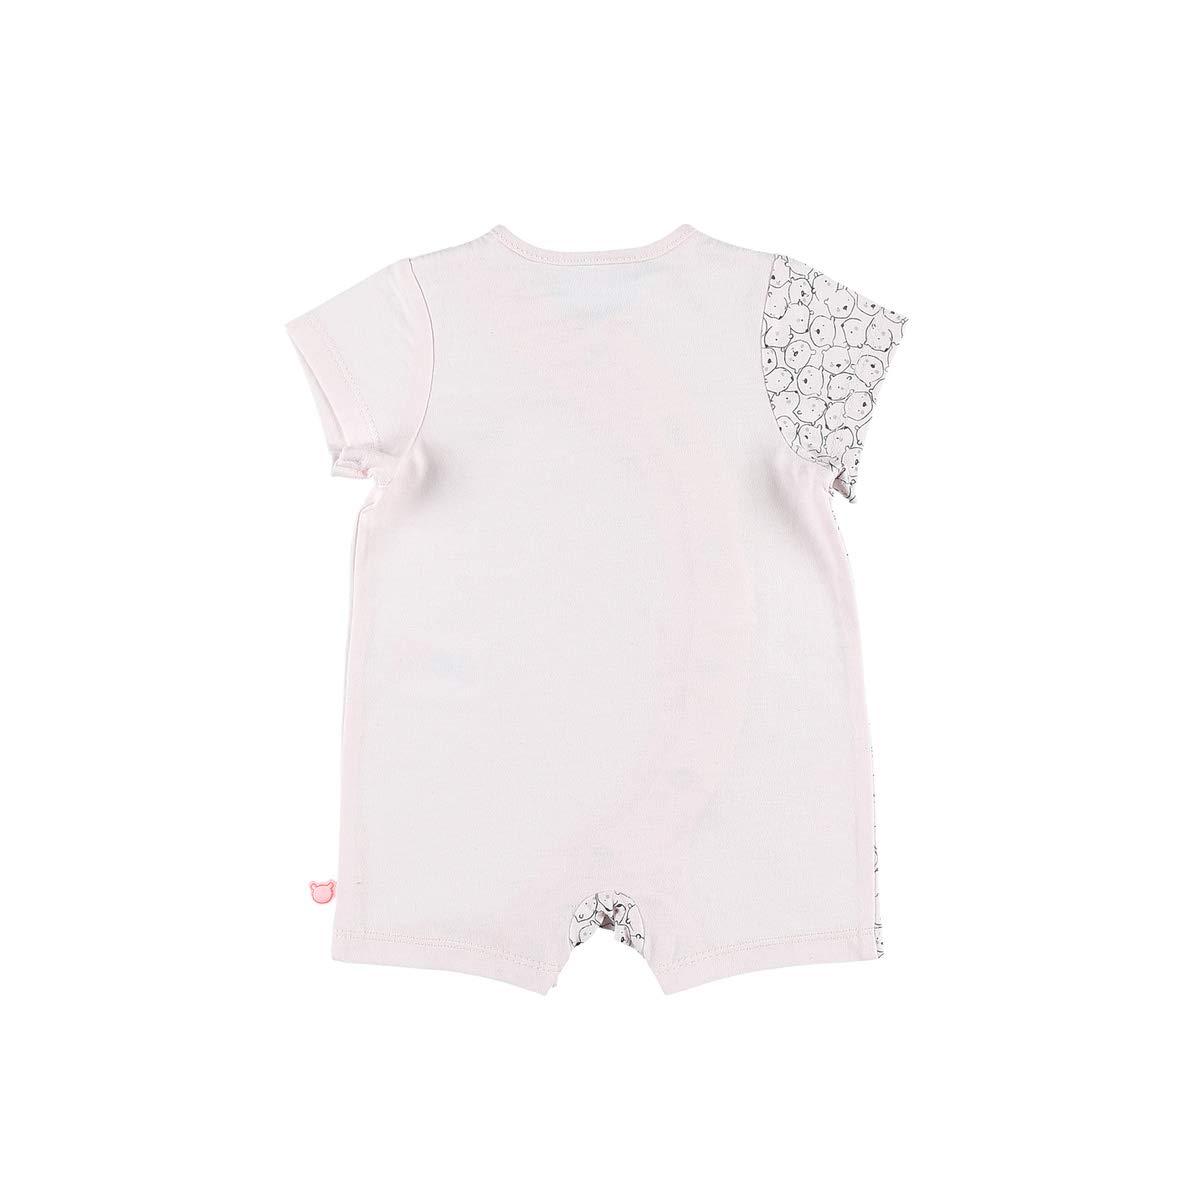 3b0597214e257 NOUKIES Combishort pyjama en jersey Bébé Mixte rose clair 9M